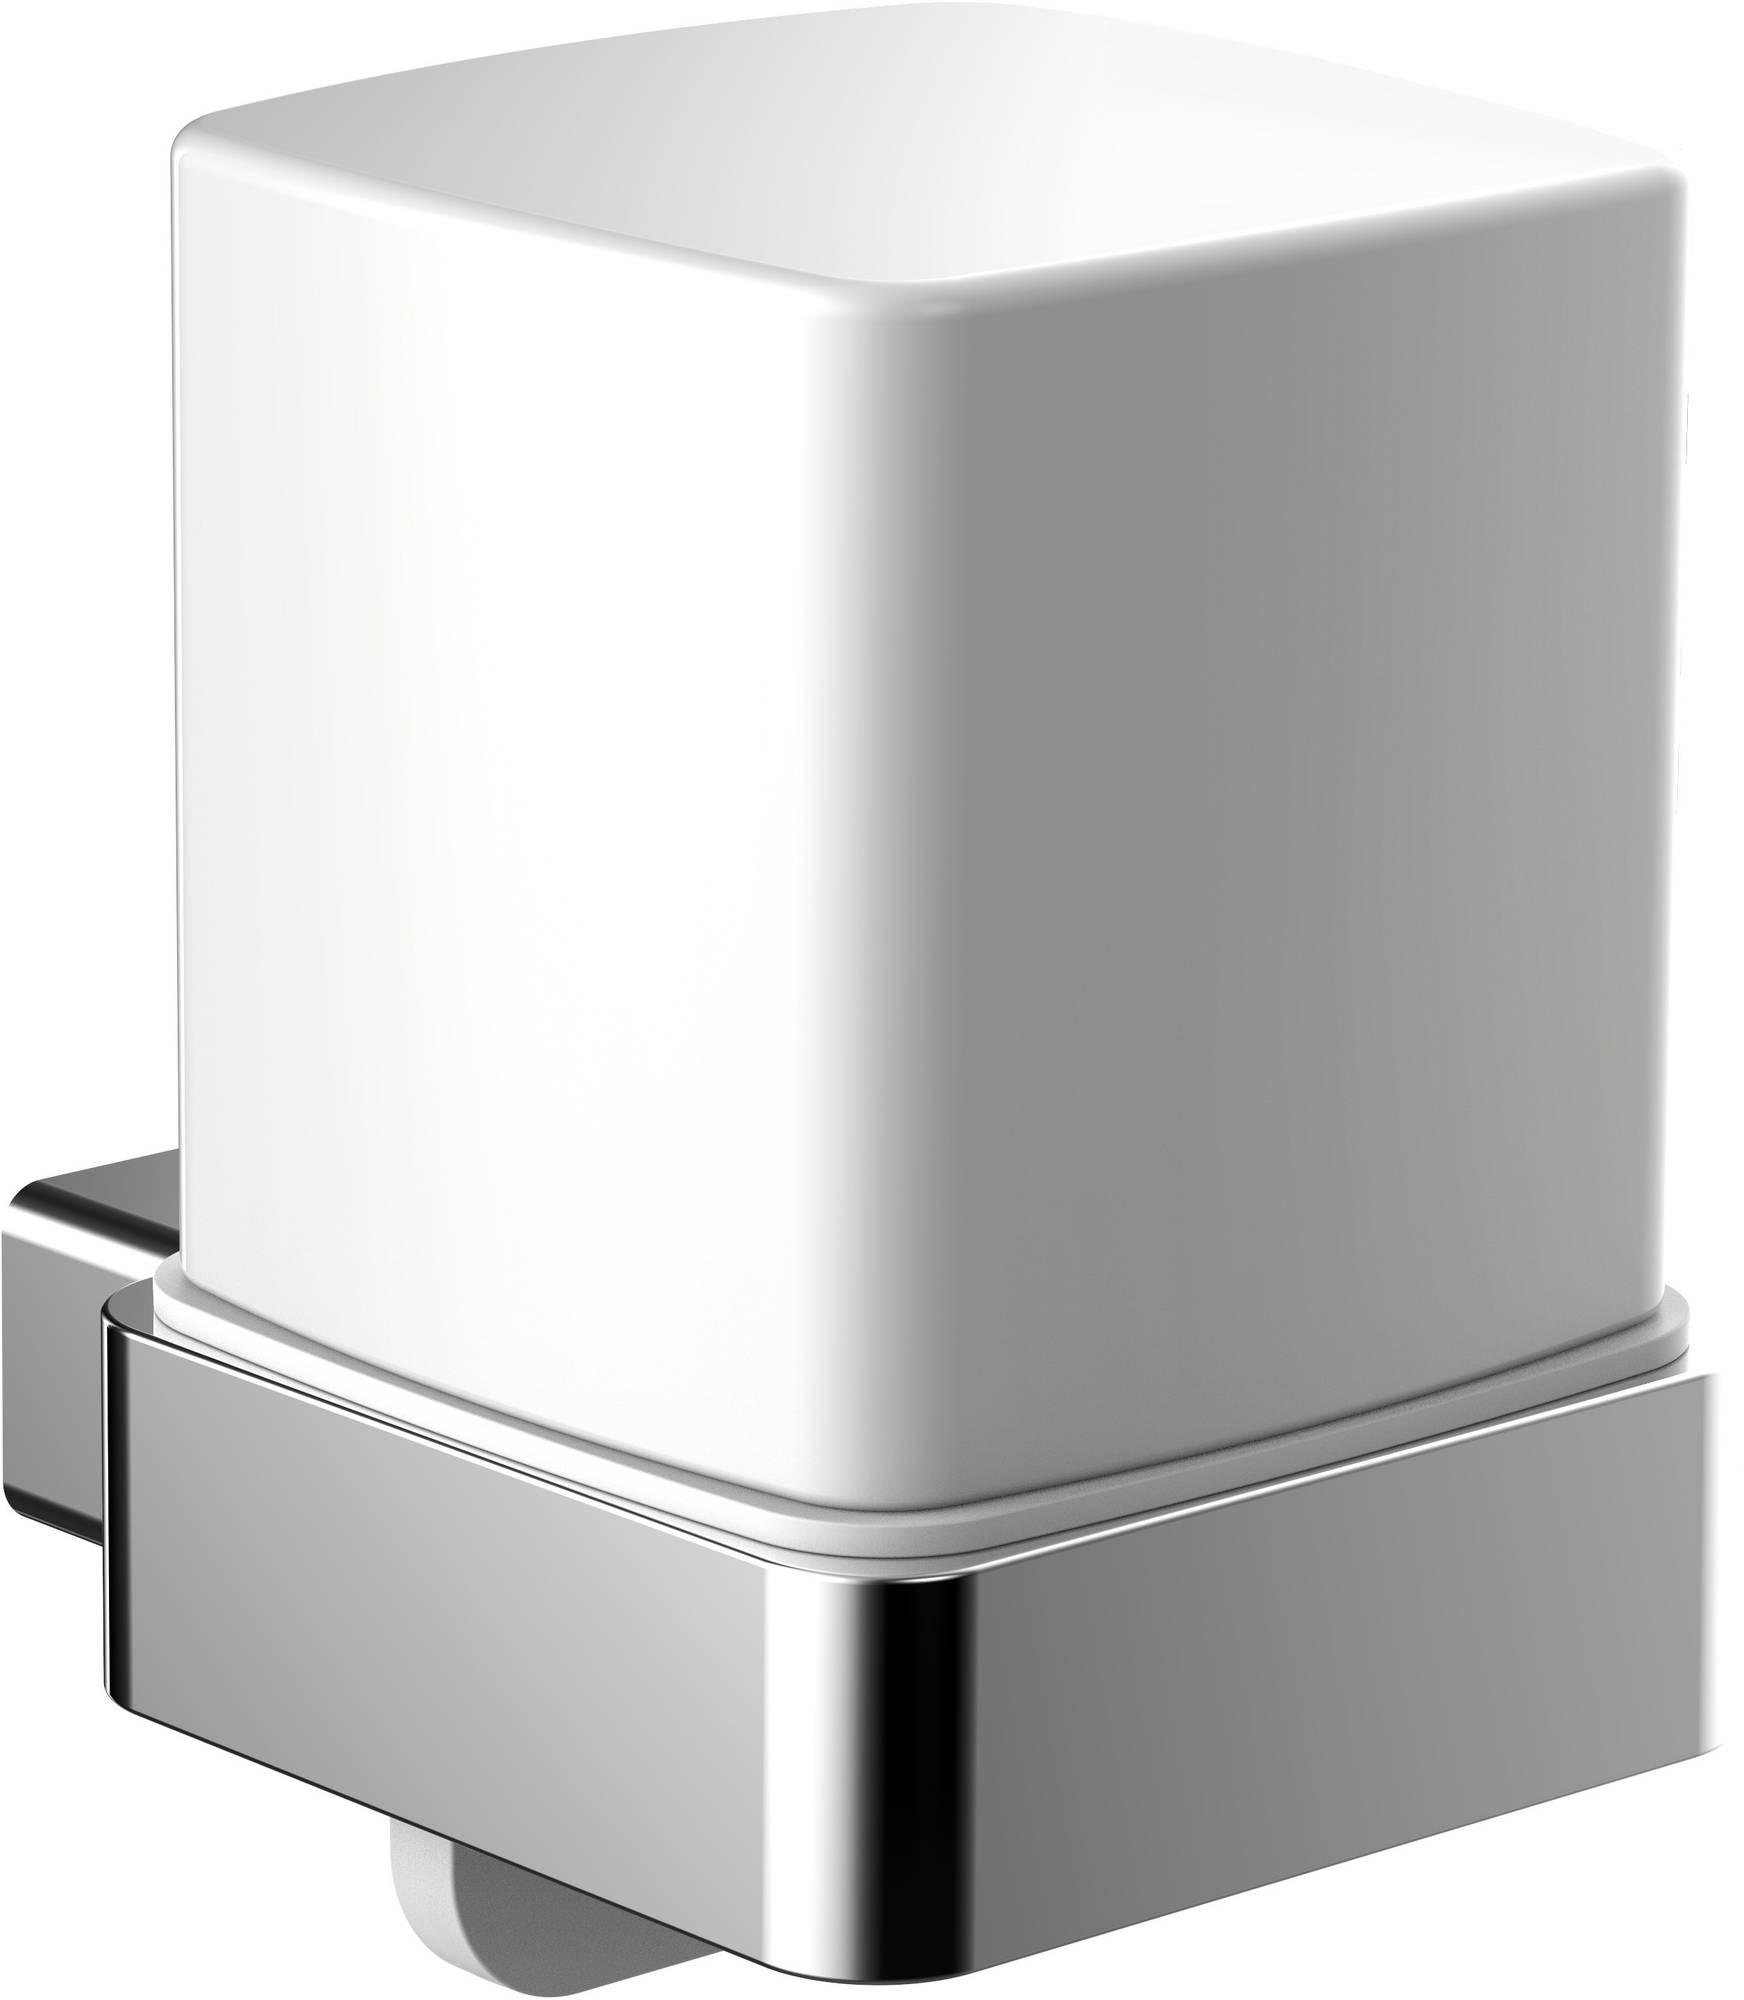 Emco Loft zeepdispenser 130 ml. bediening aan onderkant chroom